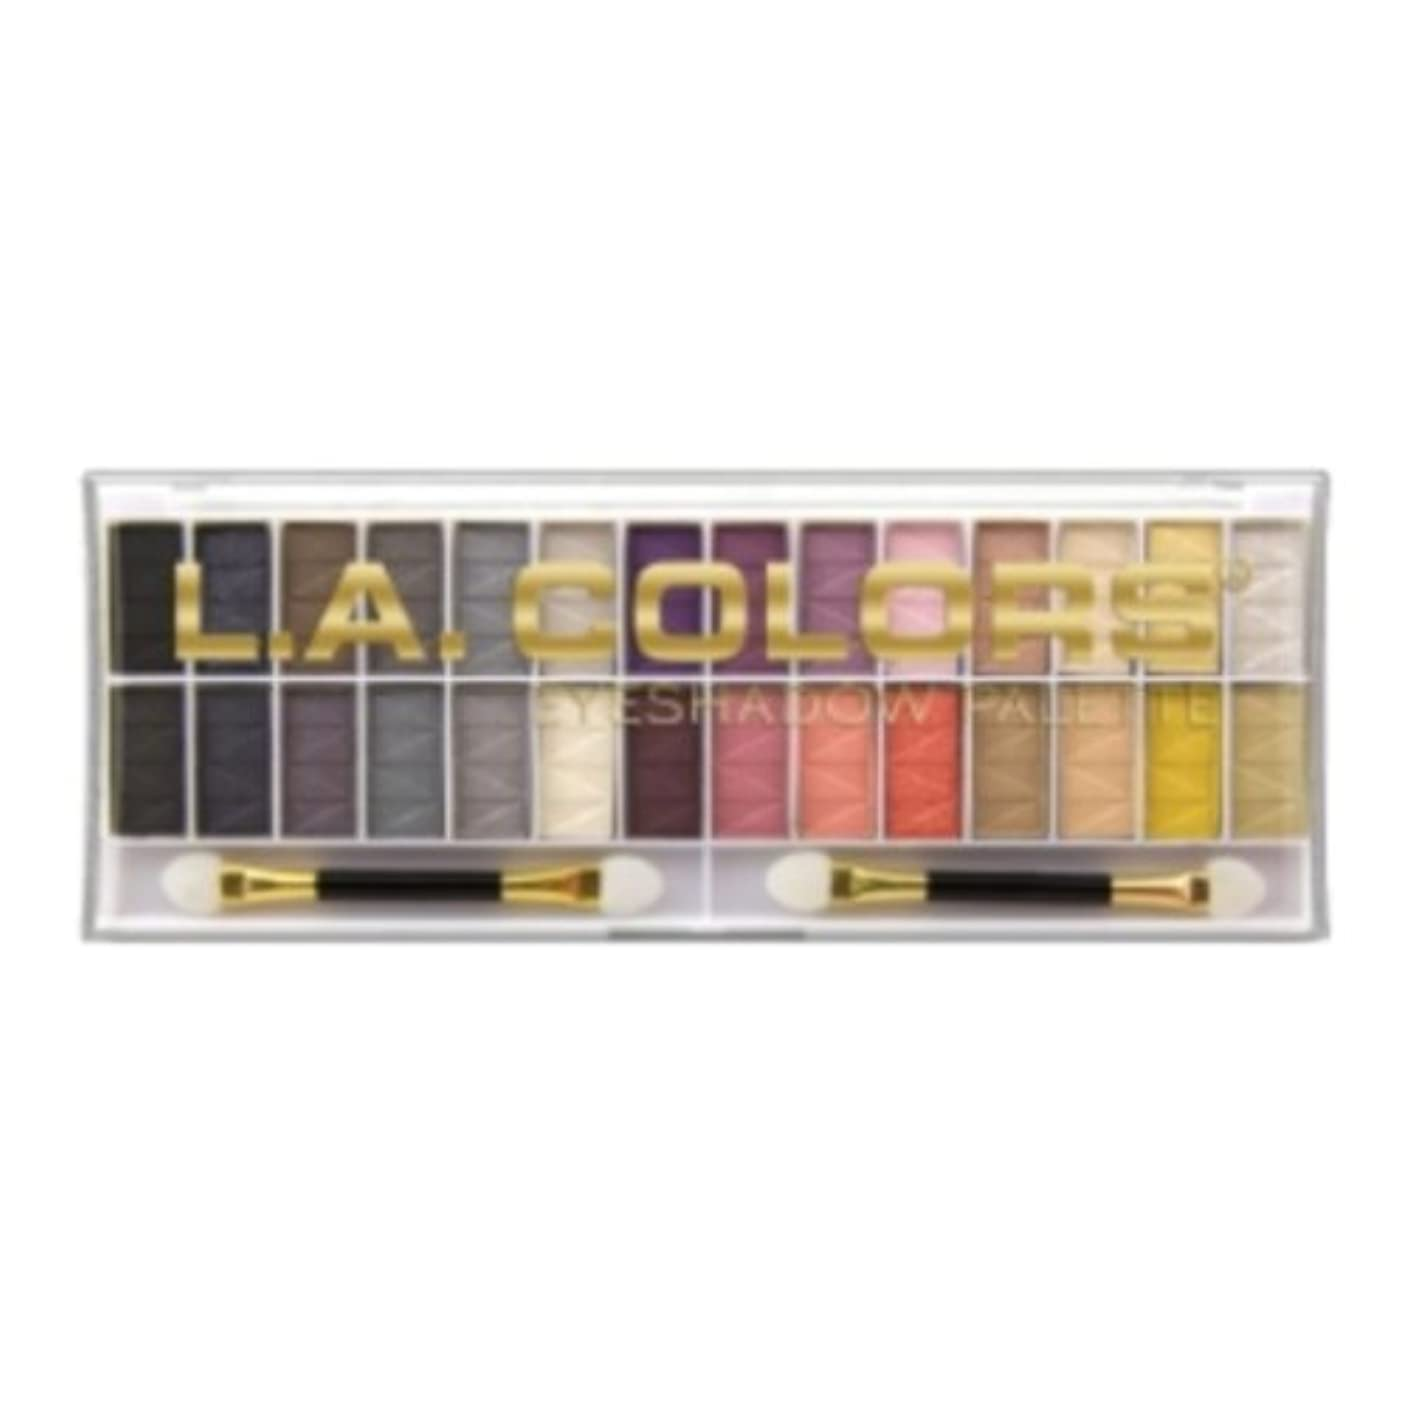 地球利点健全L.A. COLORS 28 Color Eyeshadow Palette - Malibu (並行輸入品)